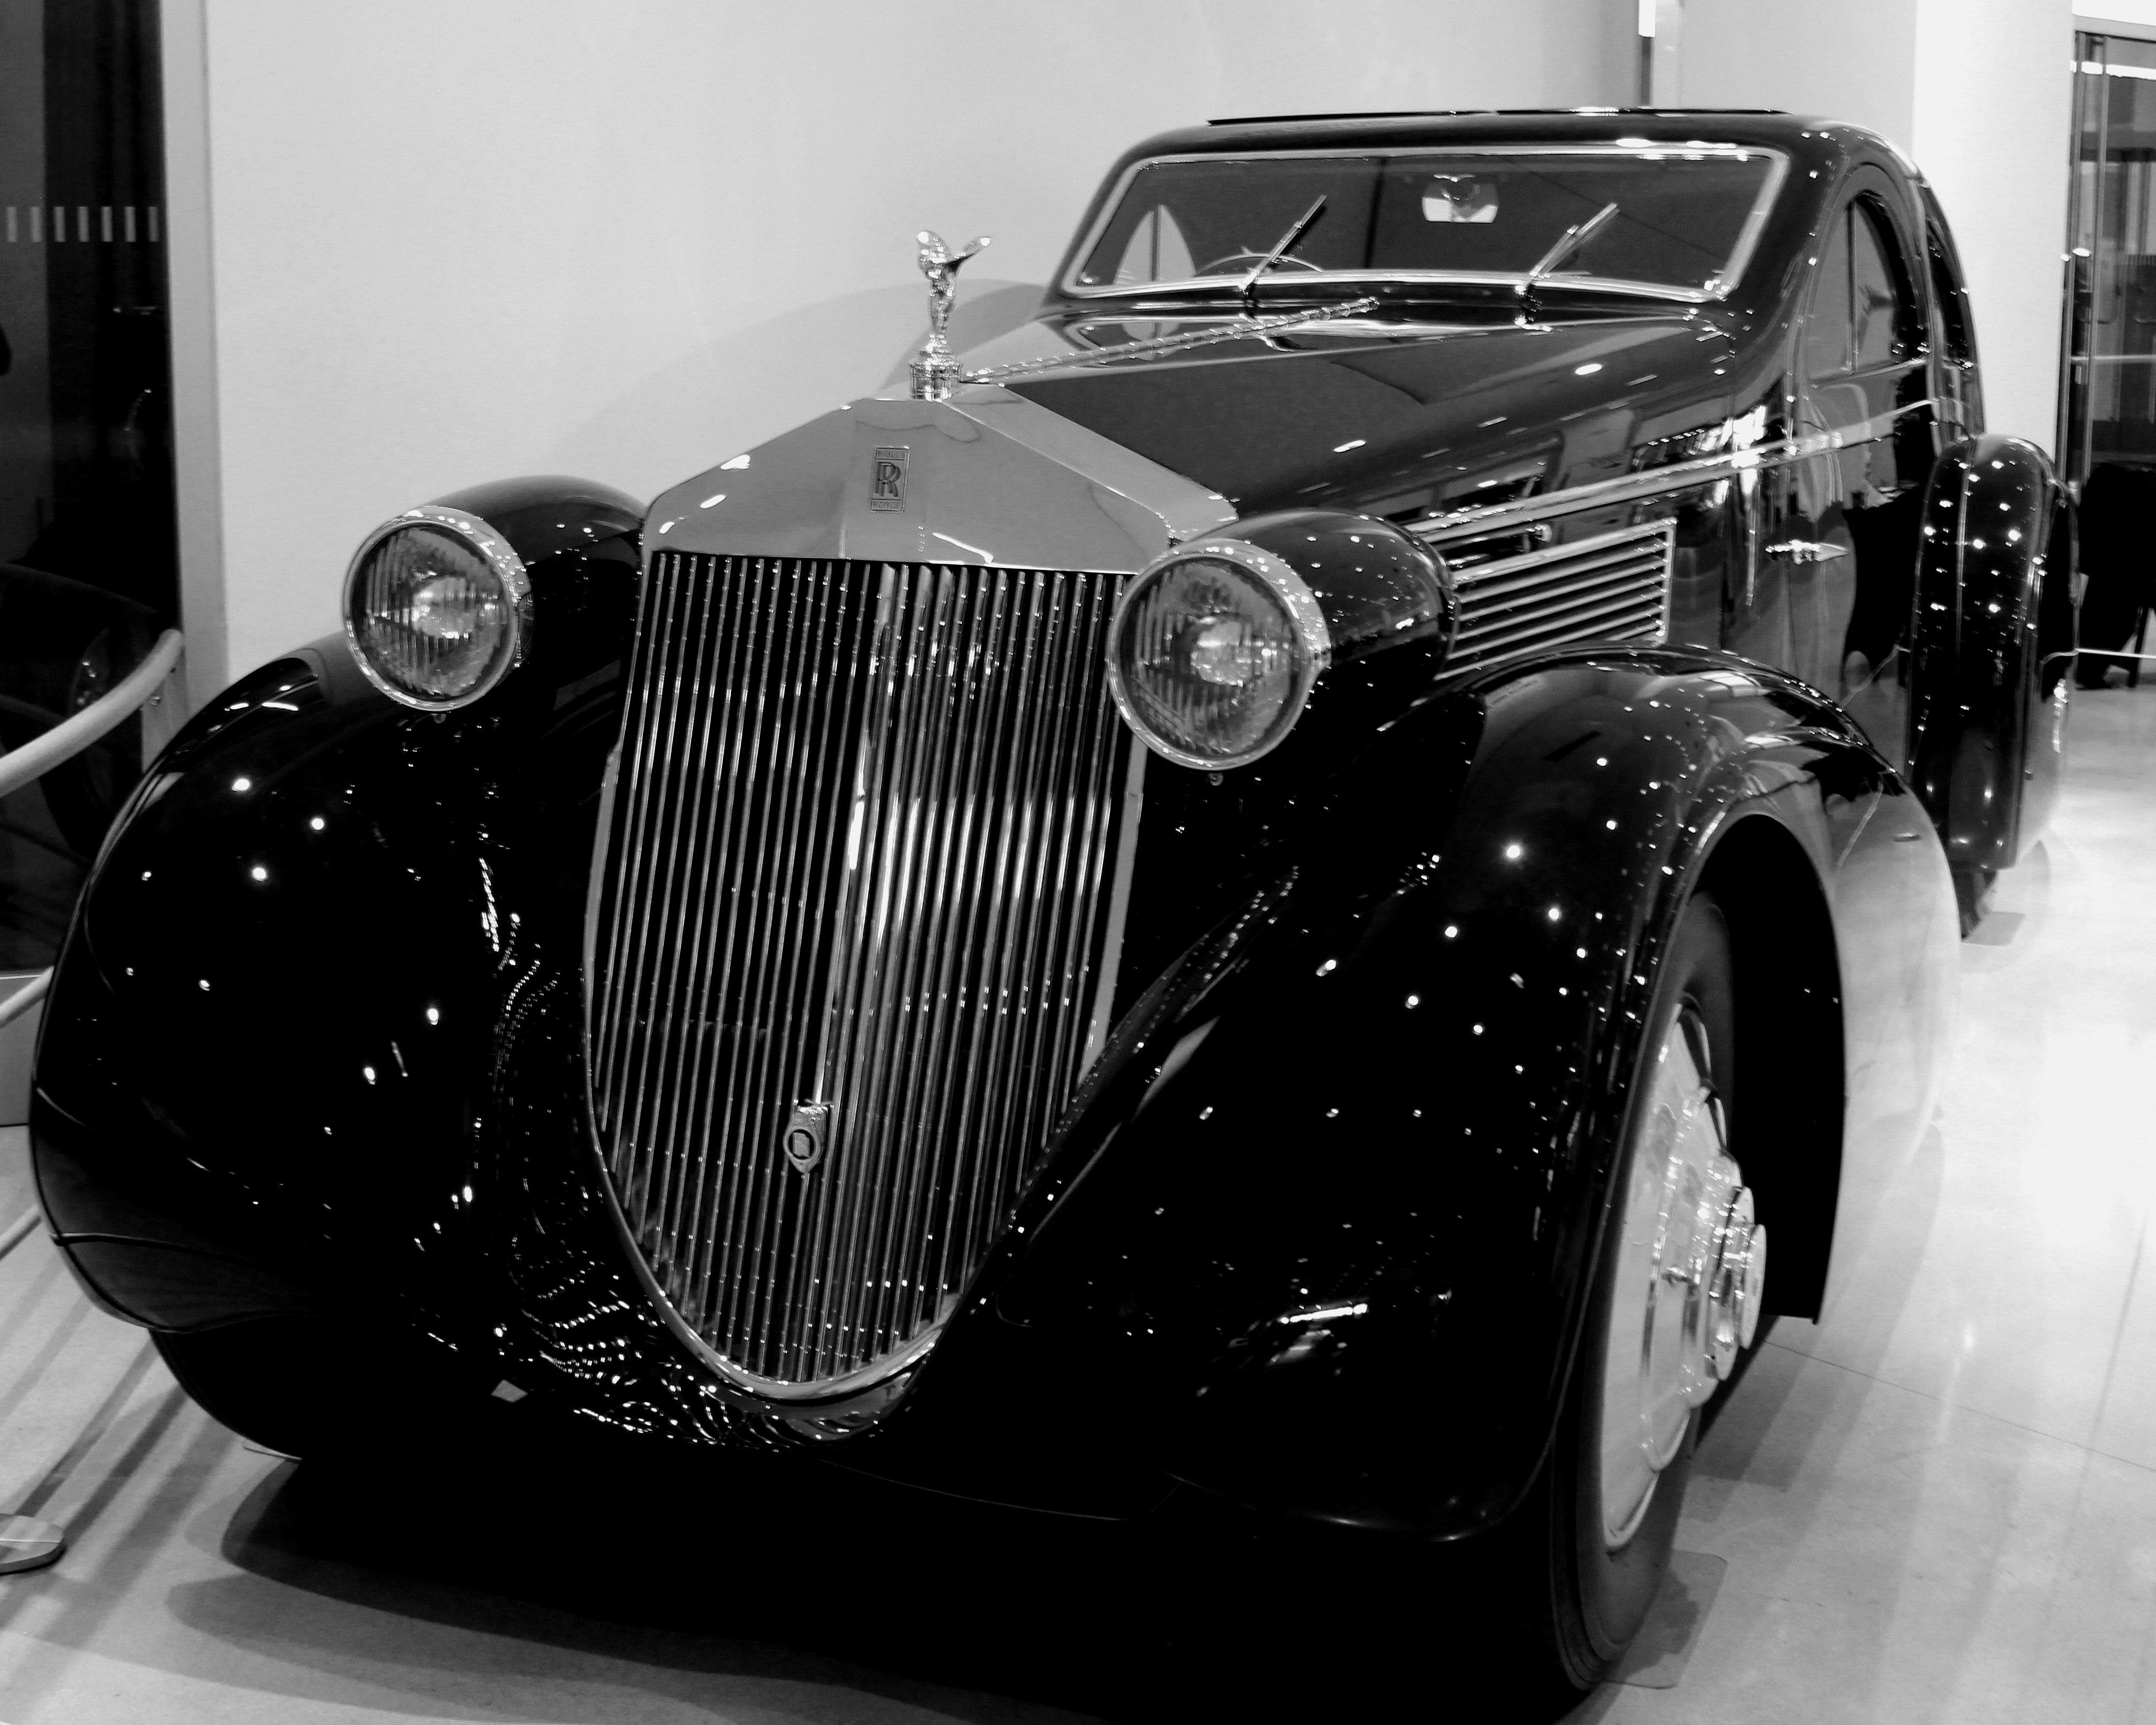 1925 Rolls Royce Phantom >> File 1925 Rolls Royce Phantom 1 30889696323 Jpg